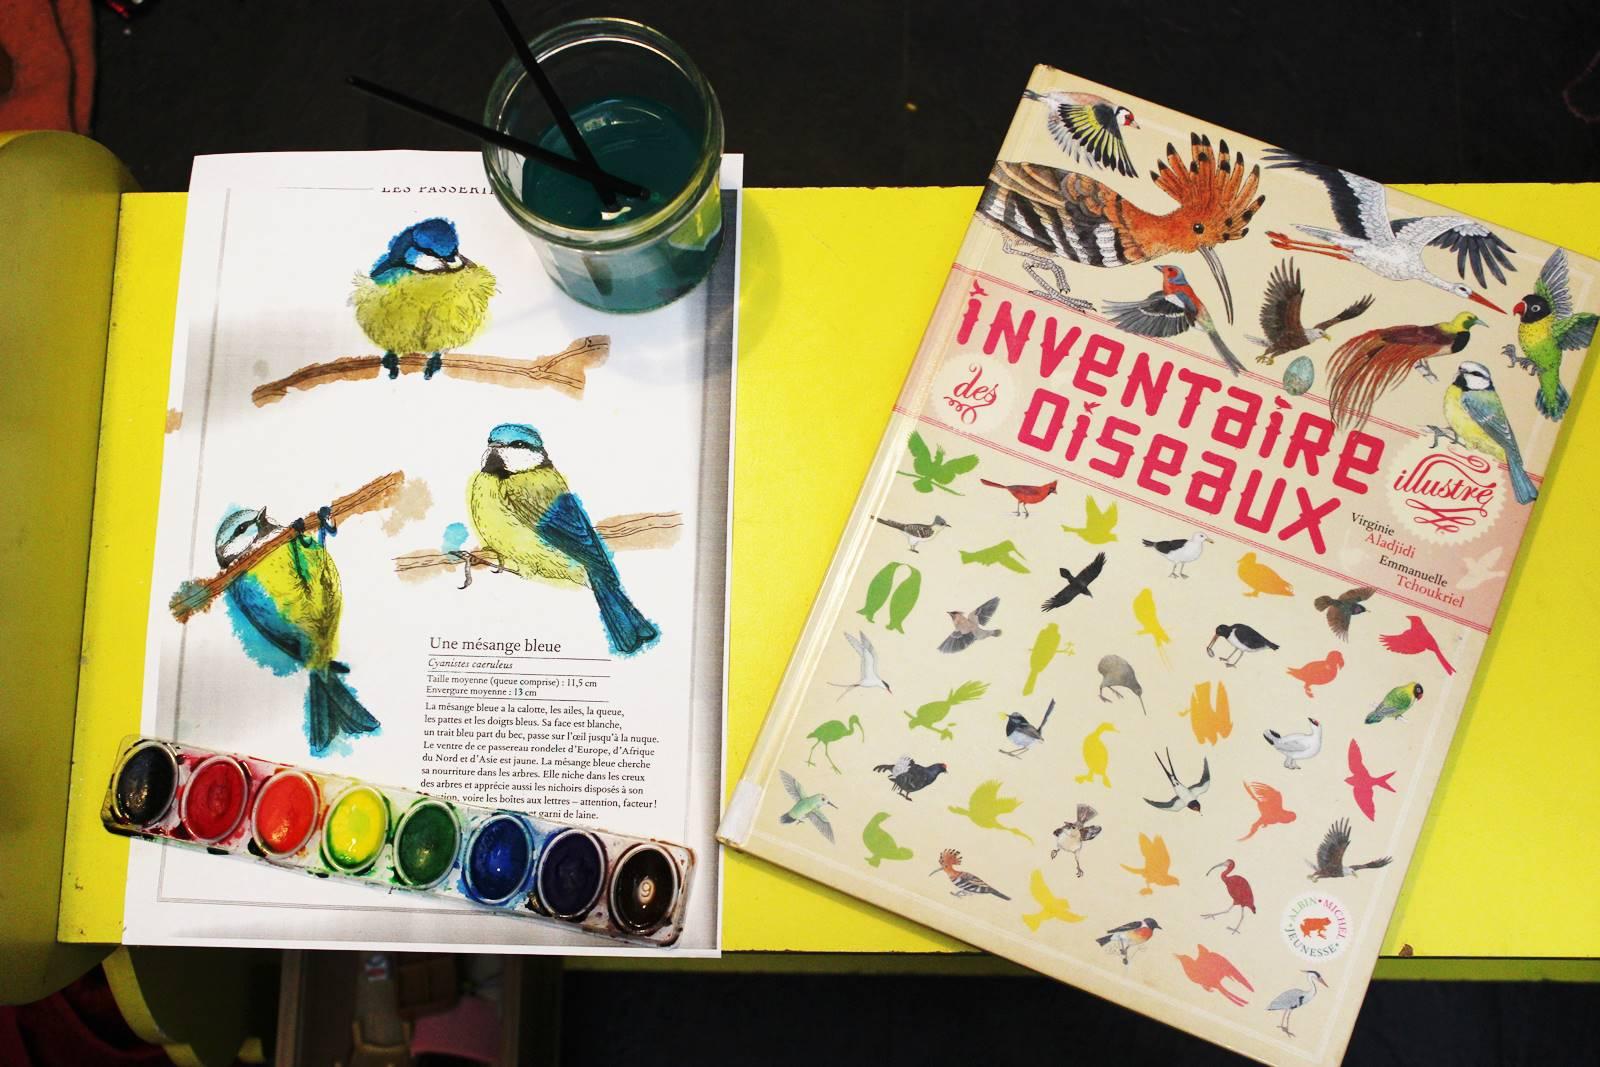 Inventaires oiseaux mesanges albilm michel